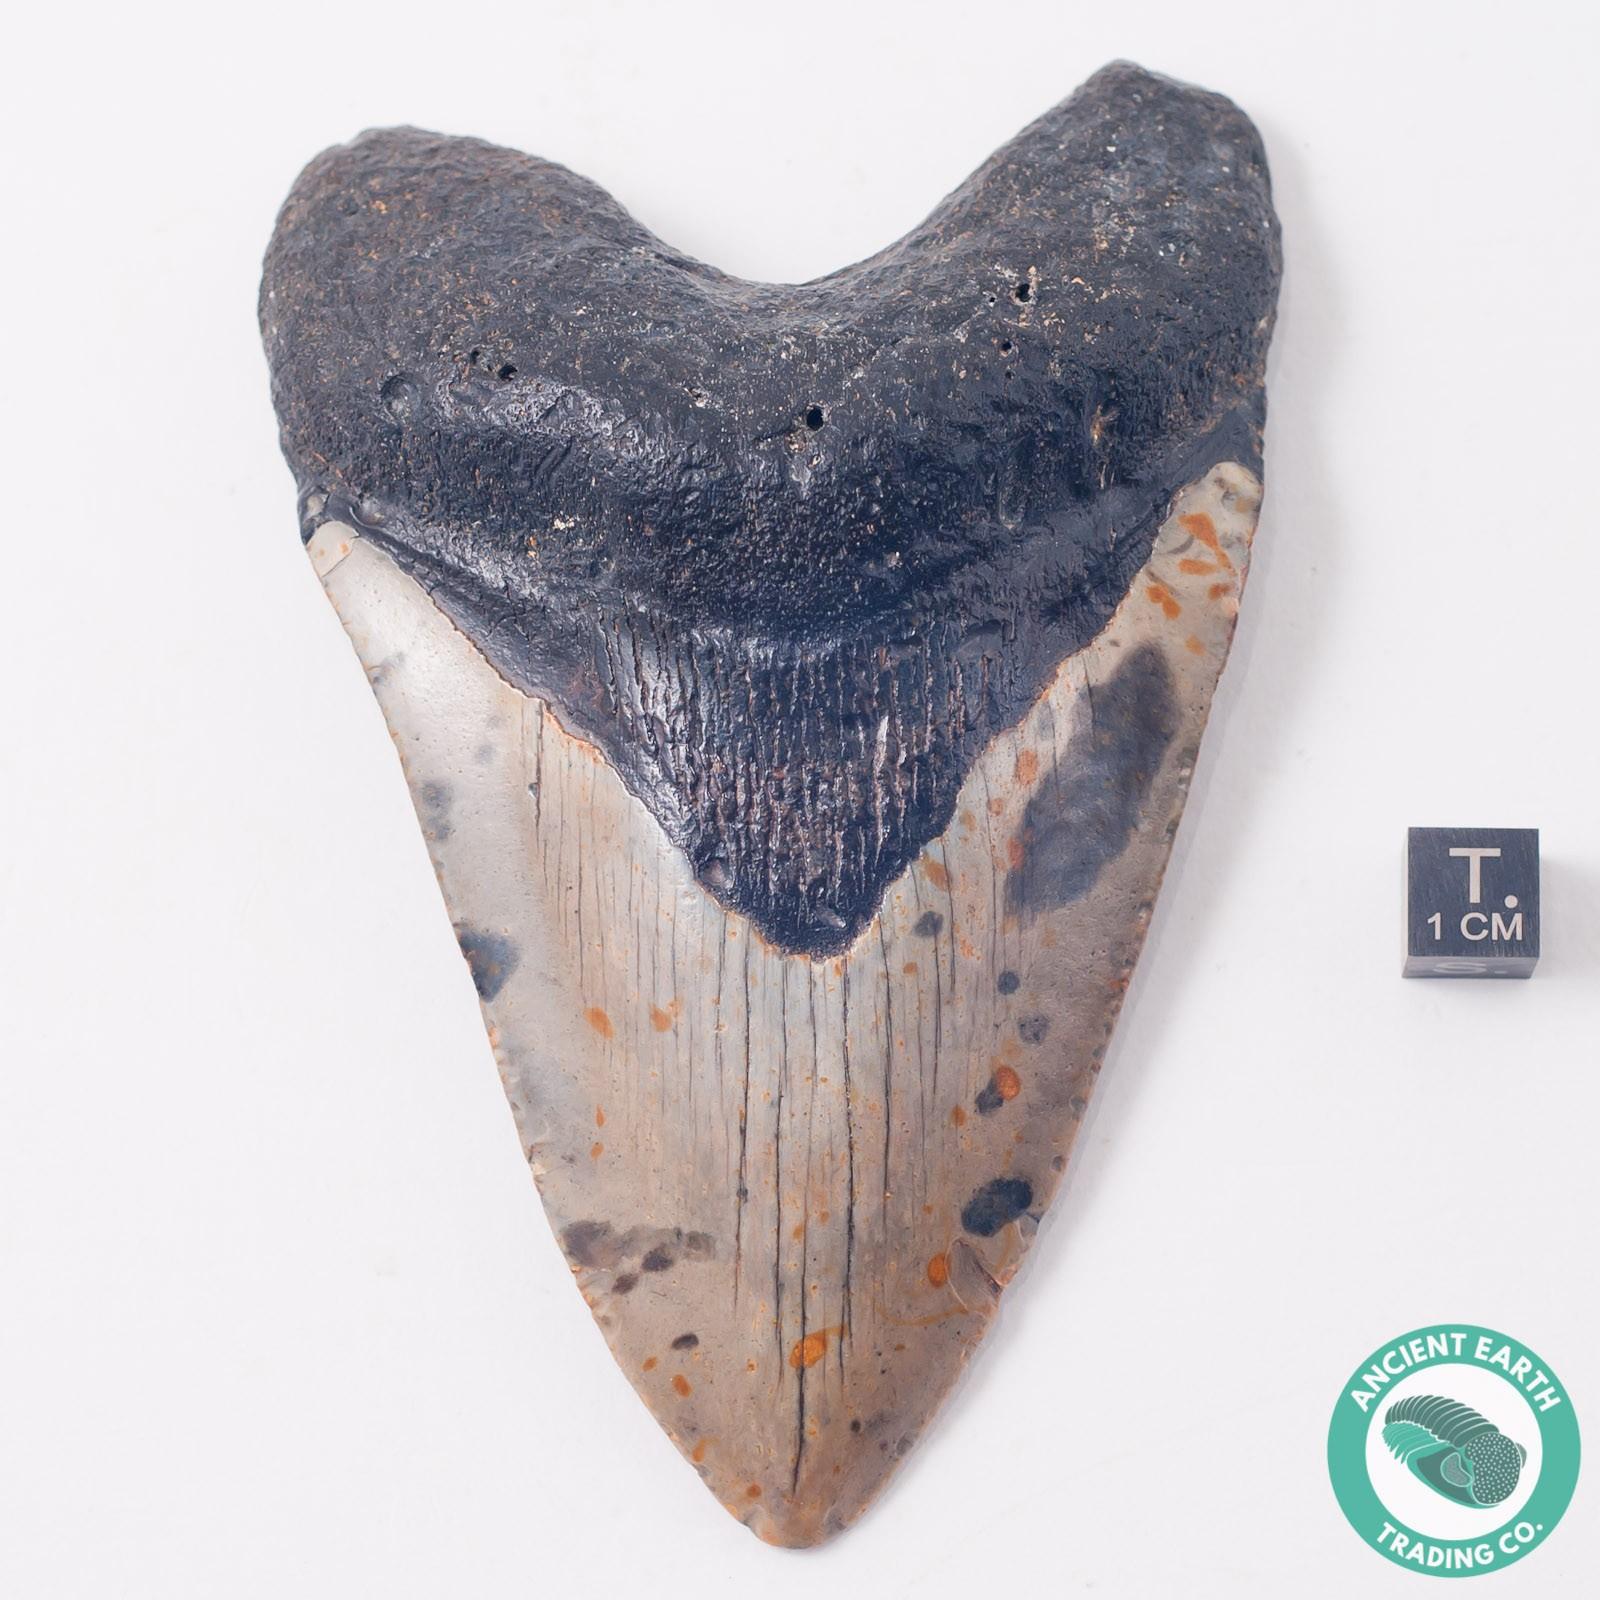 Monster 4.75 inch Megalodon Razor Sharp Shark Tooth from South Carolina